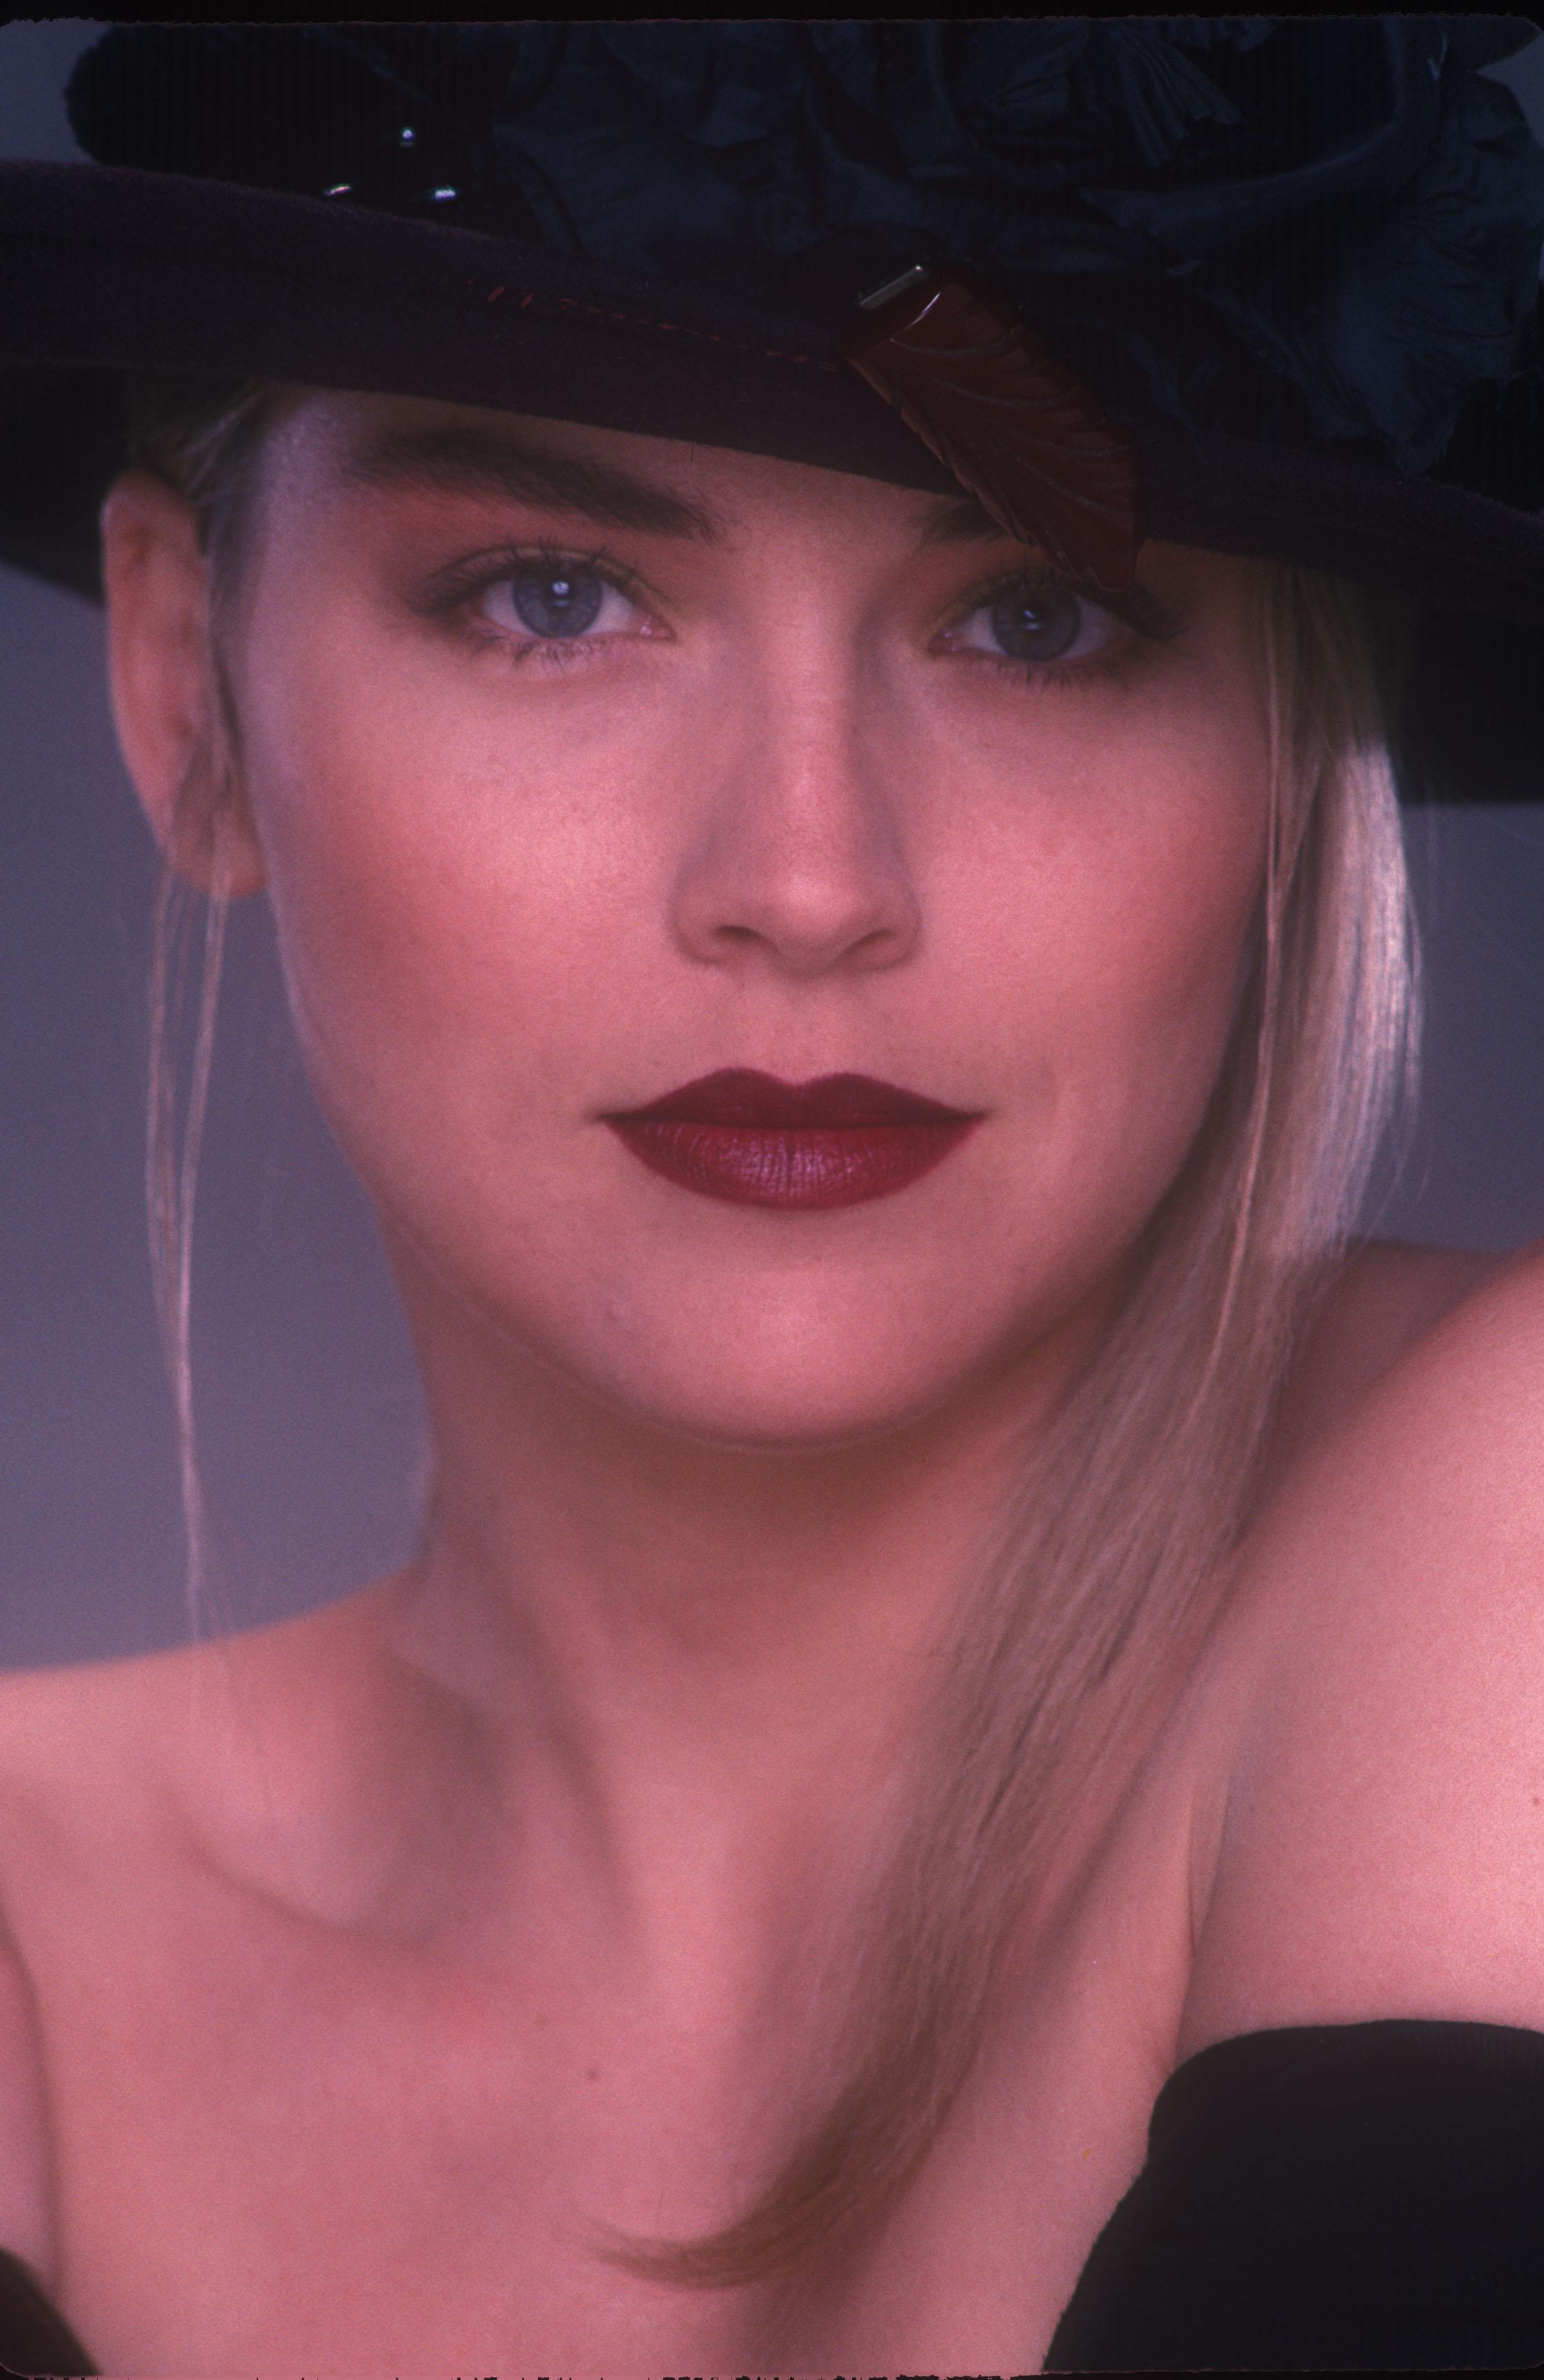 Sharon Stone Photo 461 Of 796 Pics Wallpaper Photo